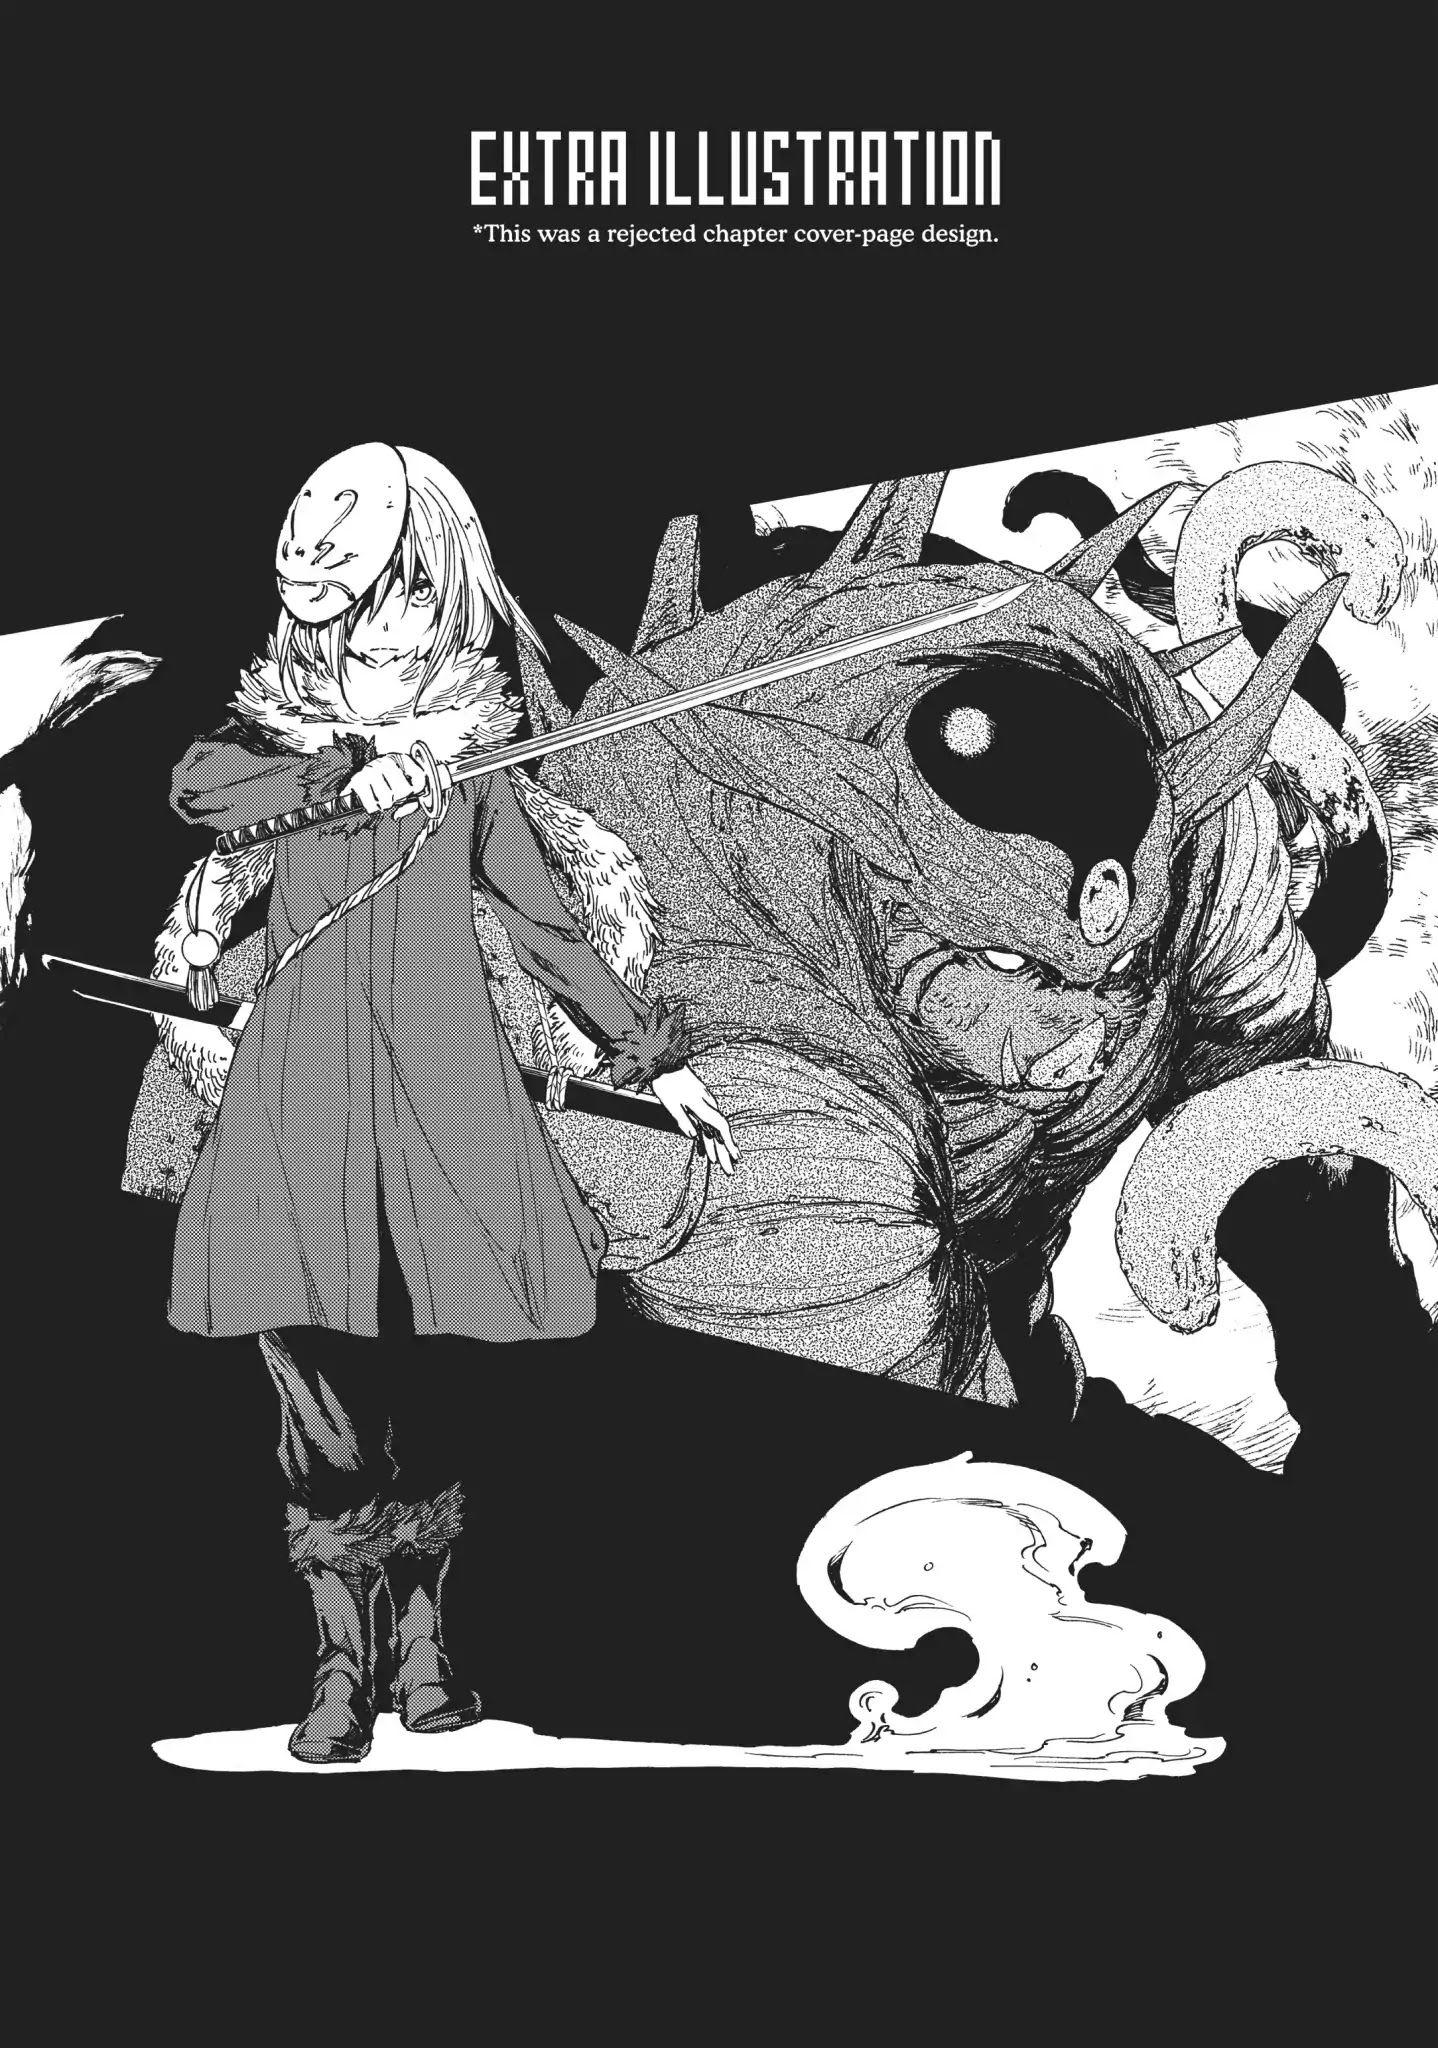 Tensei Shitara Slime Datta Ken Vol.5 Bonus Short Story